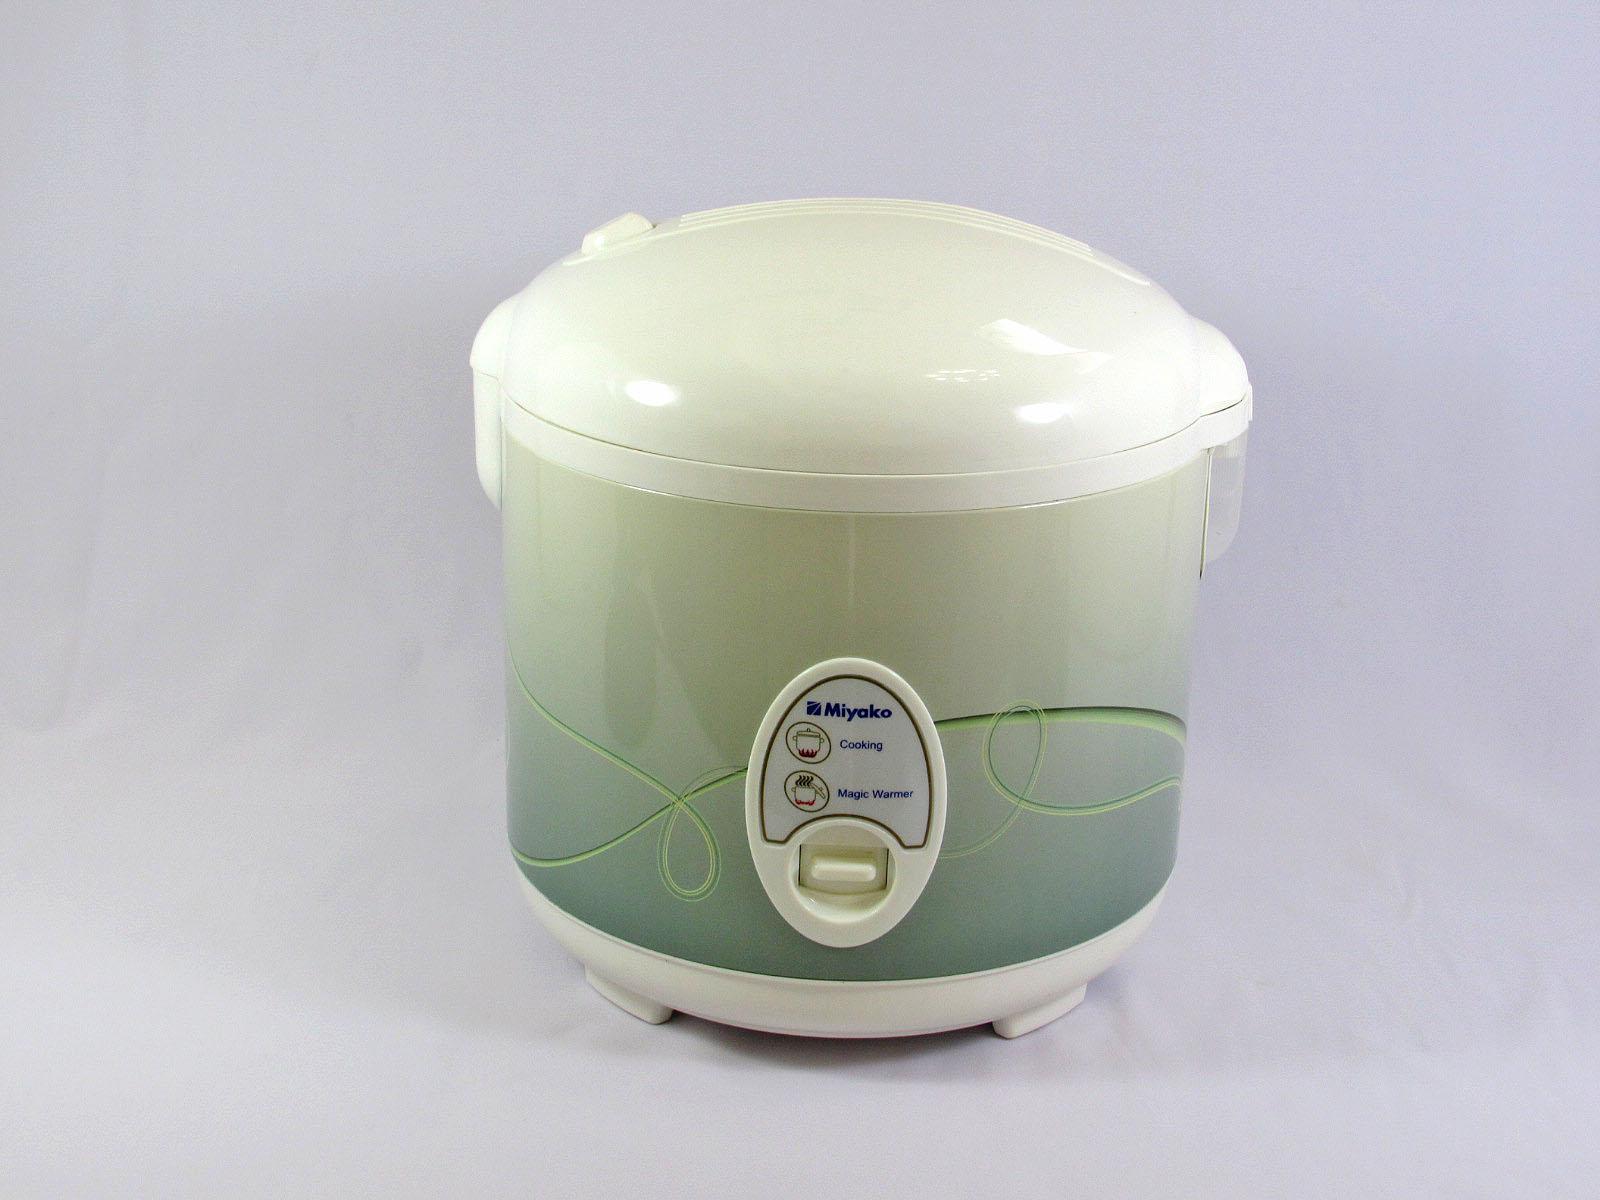 Rice Cooker Miyako Mcm 606 A Nyetrumdotcom 528